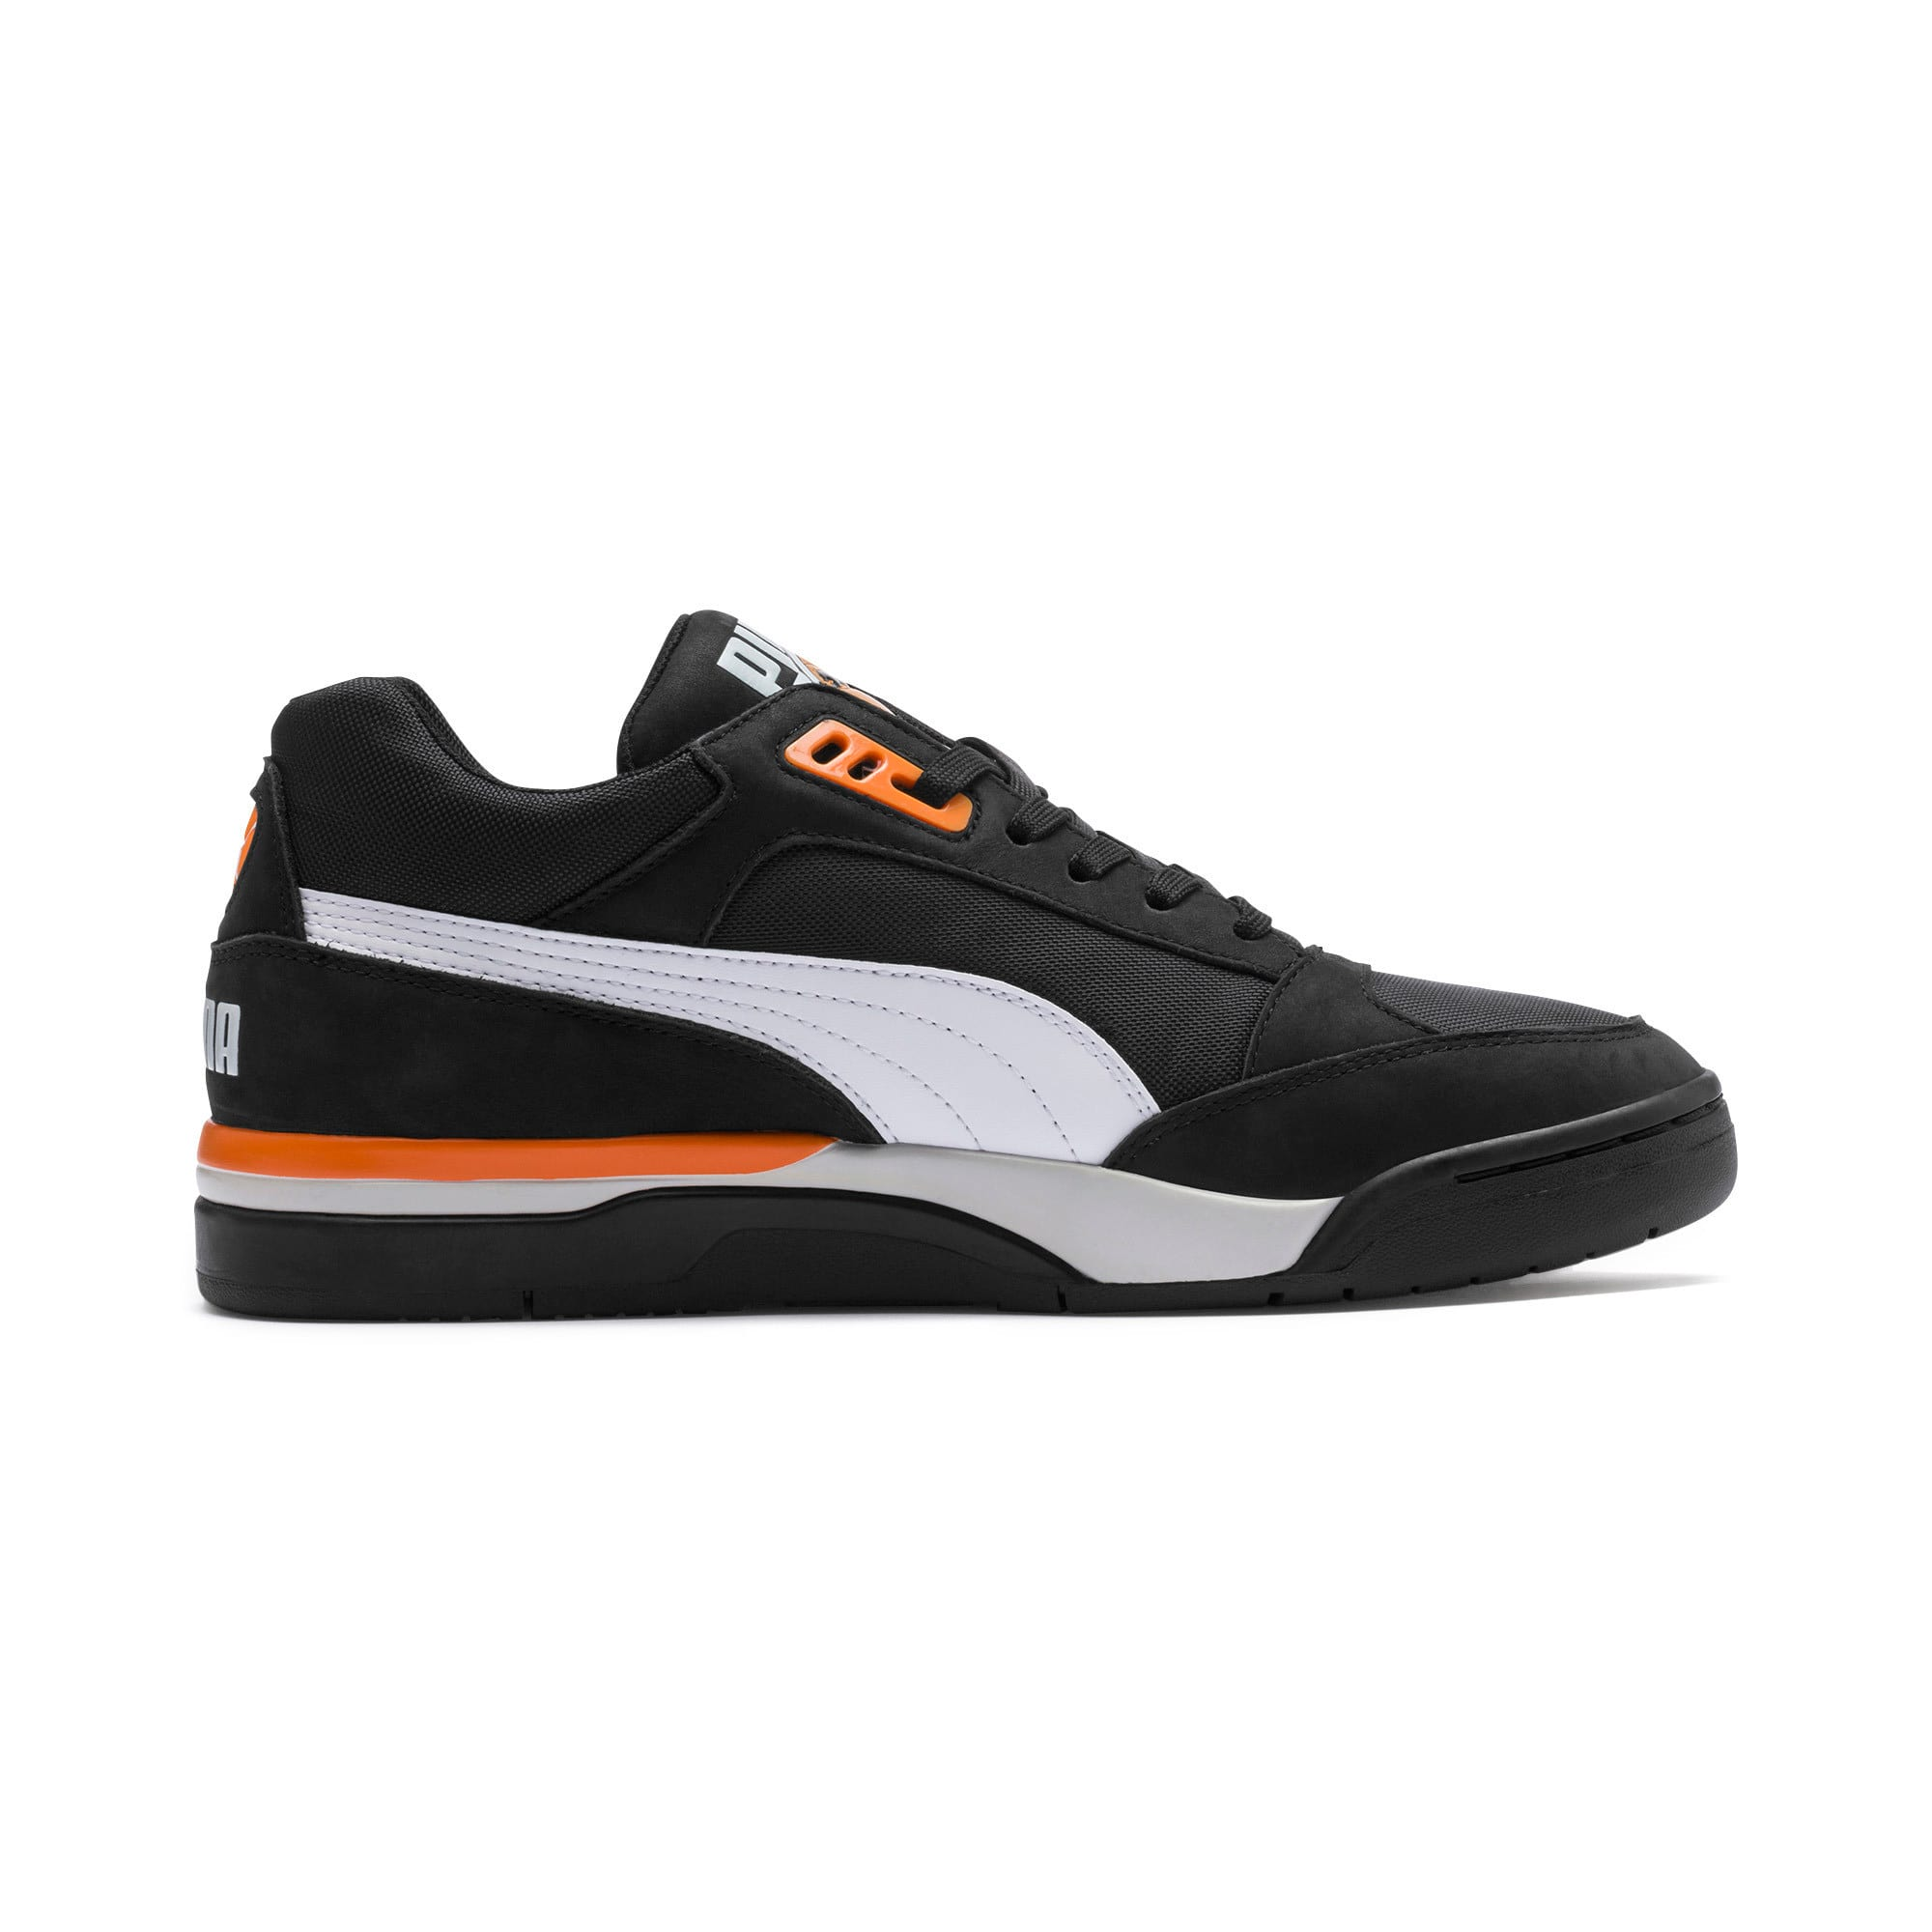 Thumbnail 5 of Palace Guard BB Sneakers, Puma Black-Puma White-, medium